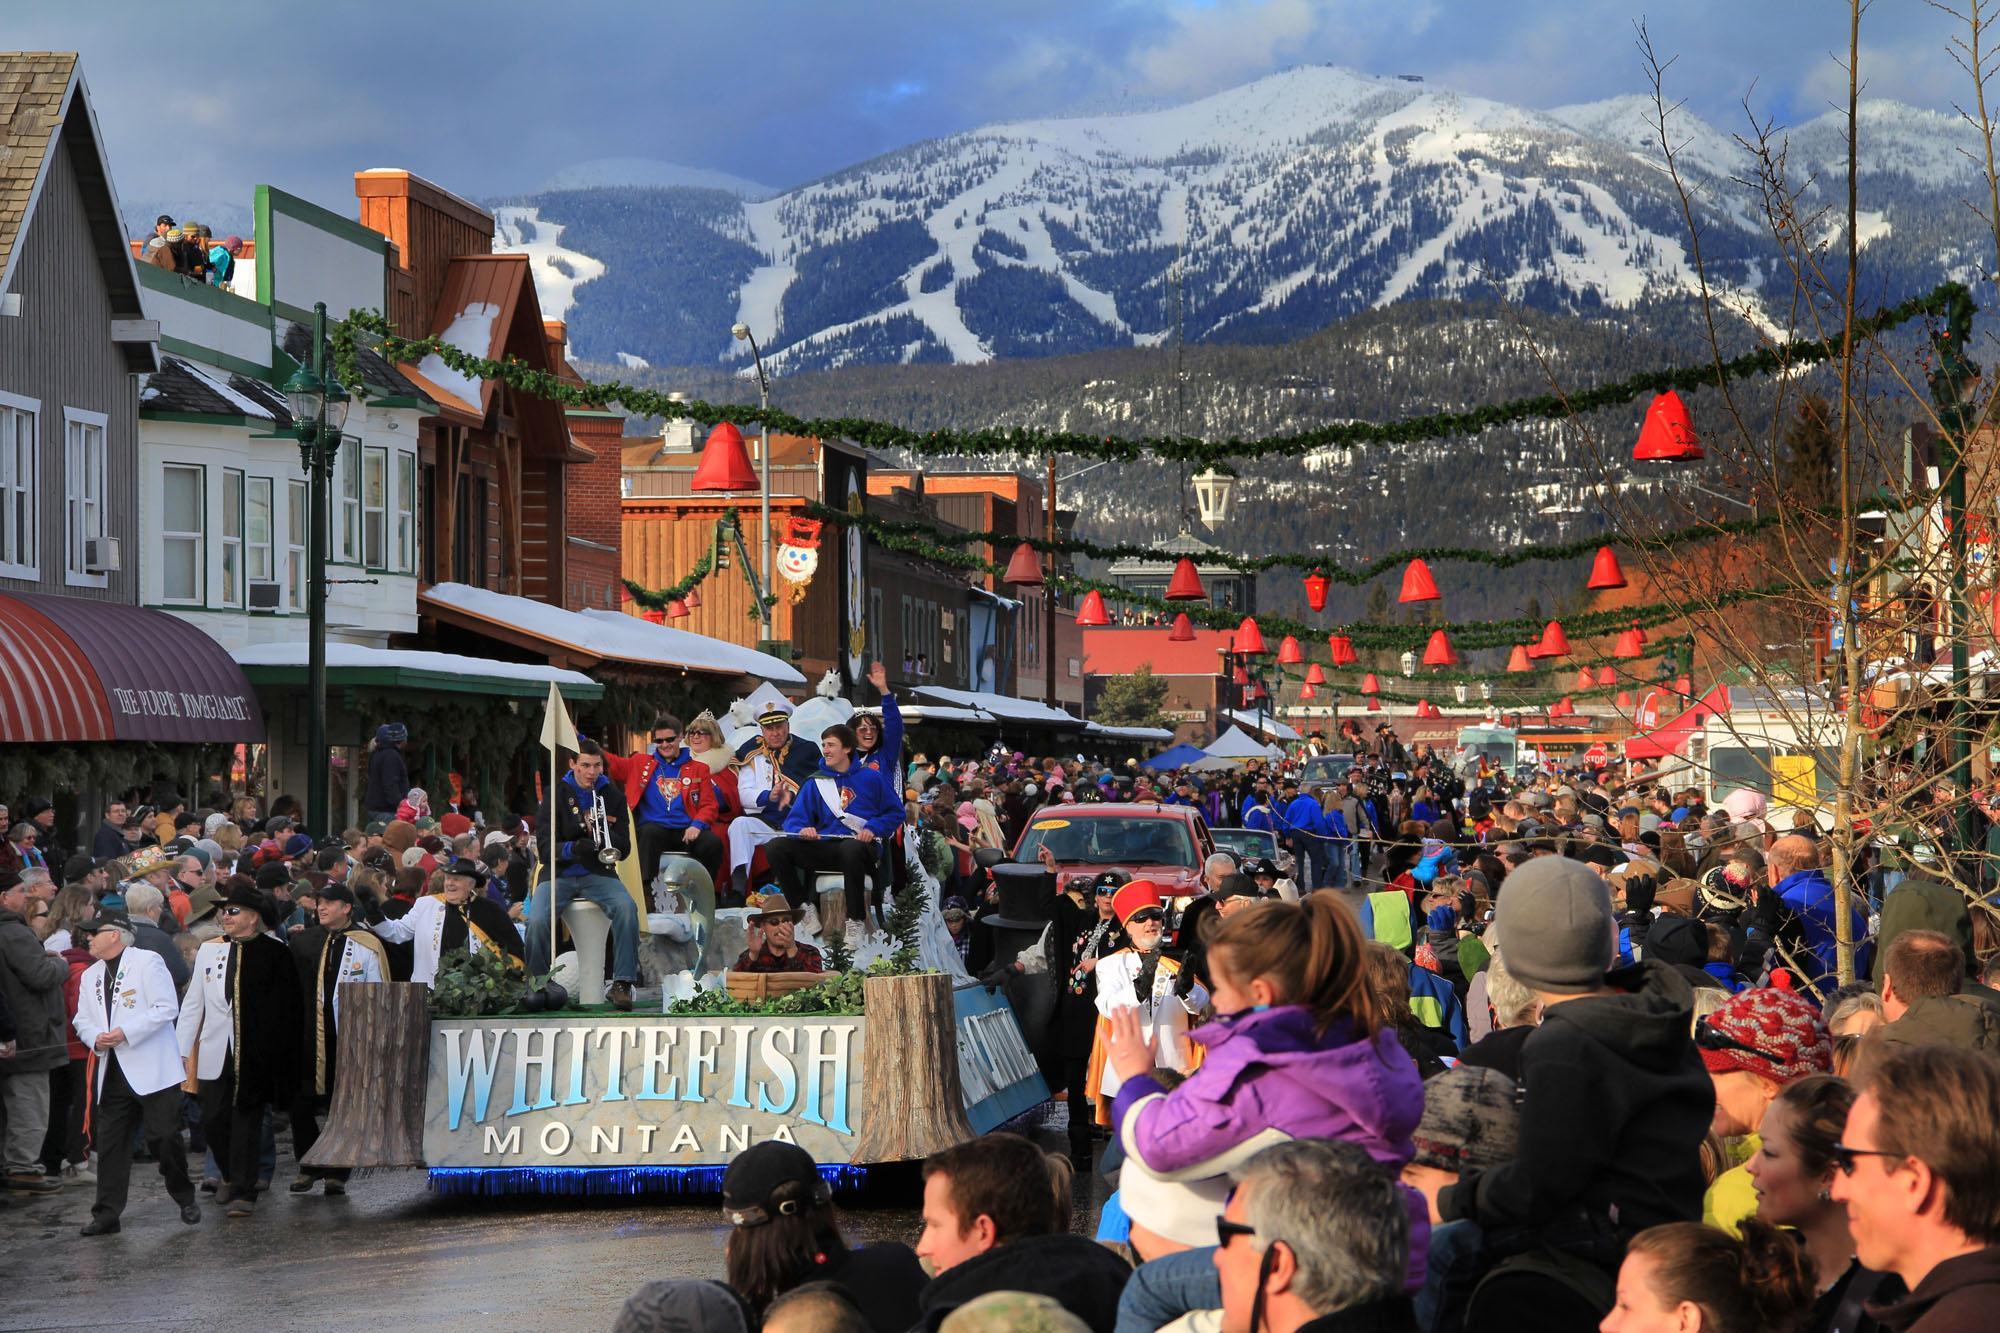 Christmas Carnival Whitefish Mt 2020 Whitefish Winter Carnival | Whitefish Montana Lodging, Dining, and